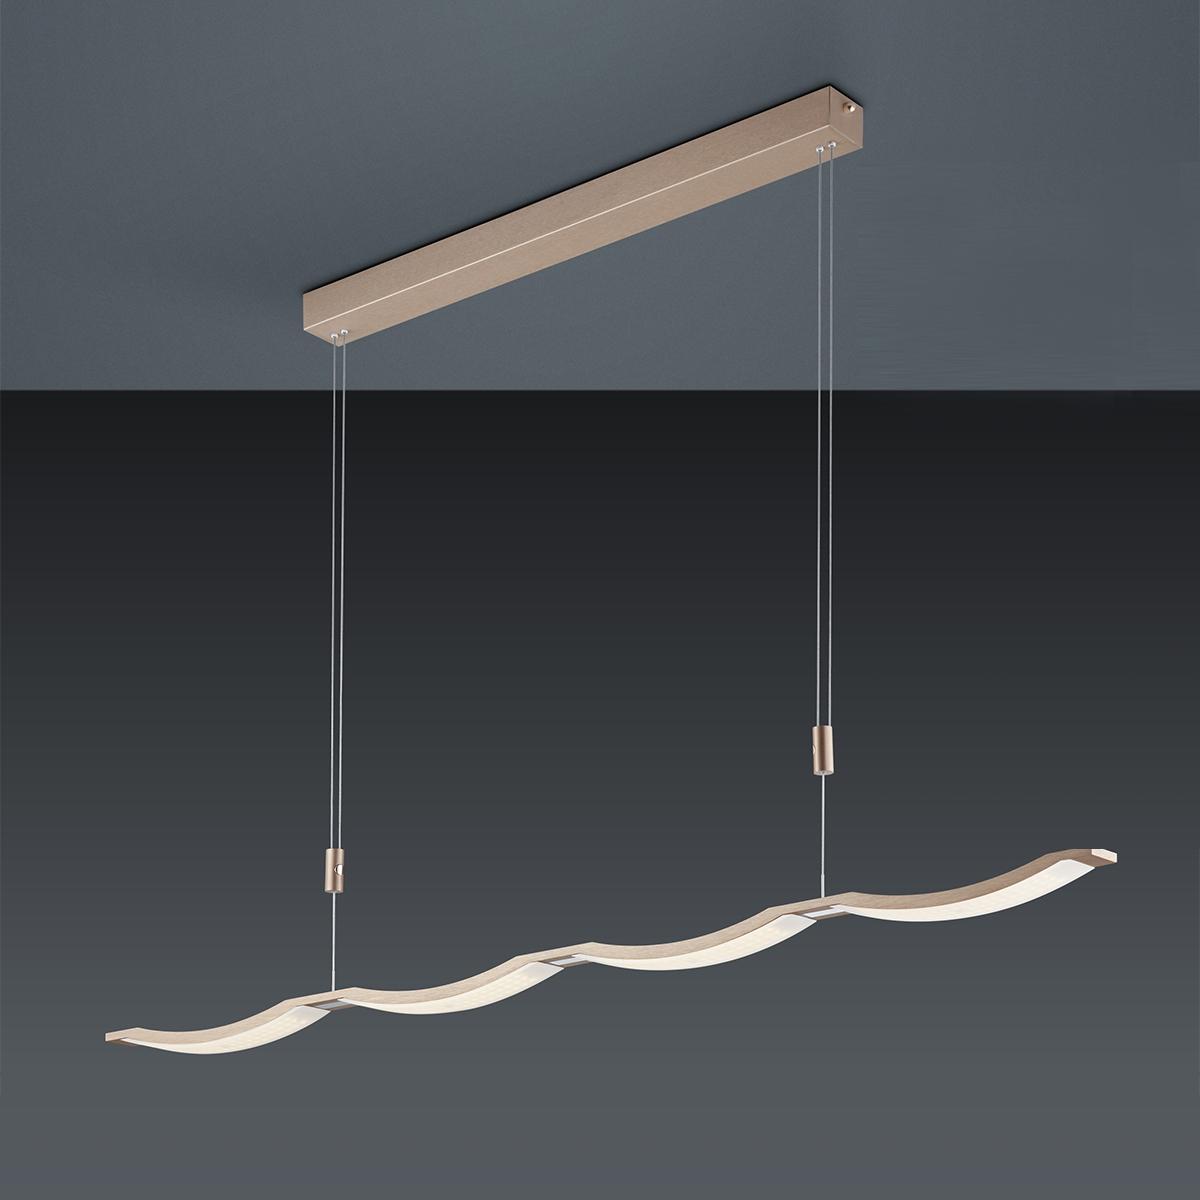 Bankamp Surf LED Pendelleuchte, Auslaufmodell 2139/1-74